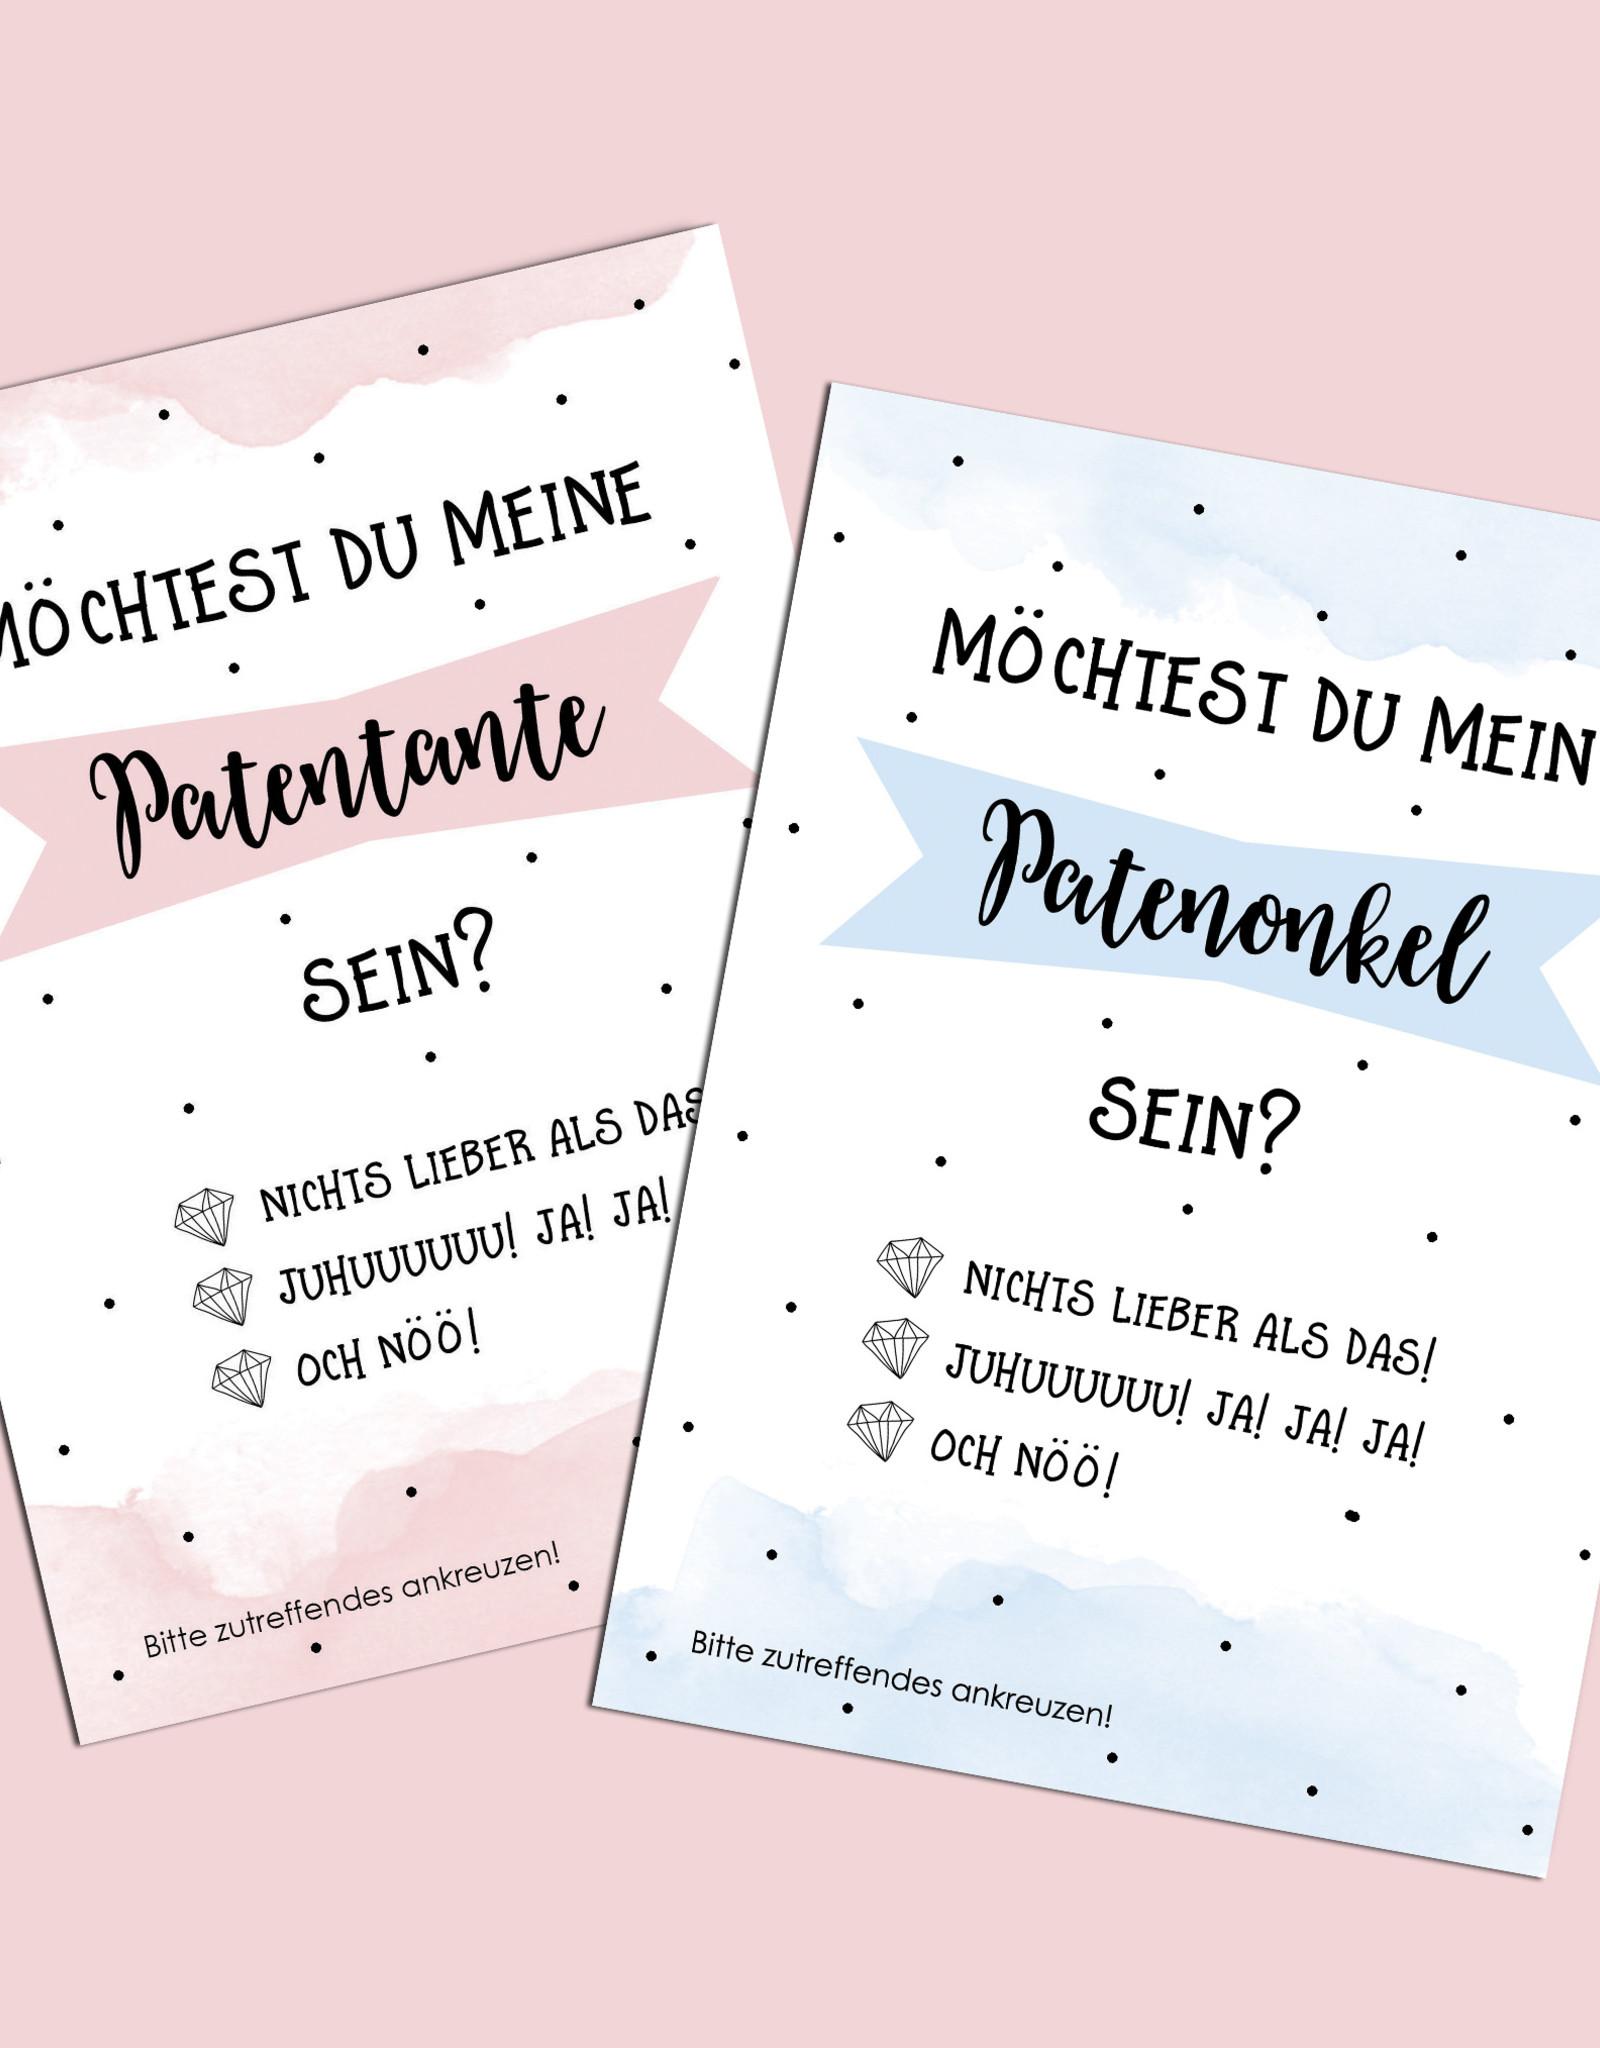 Postkarten Pate fragen 2er Set Patenonkel fragen Patentante fragen